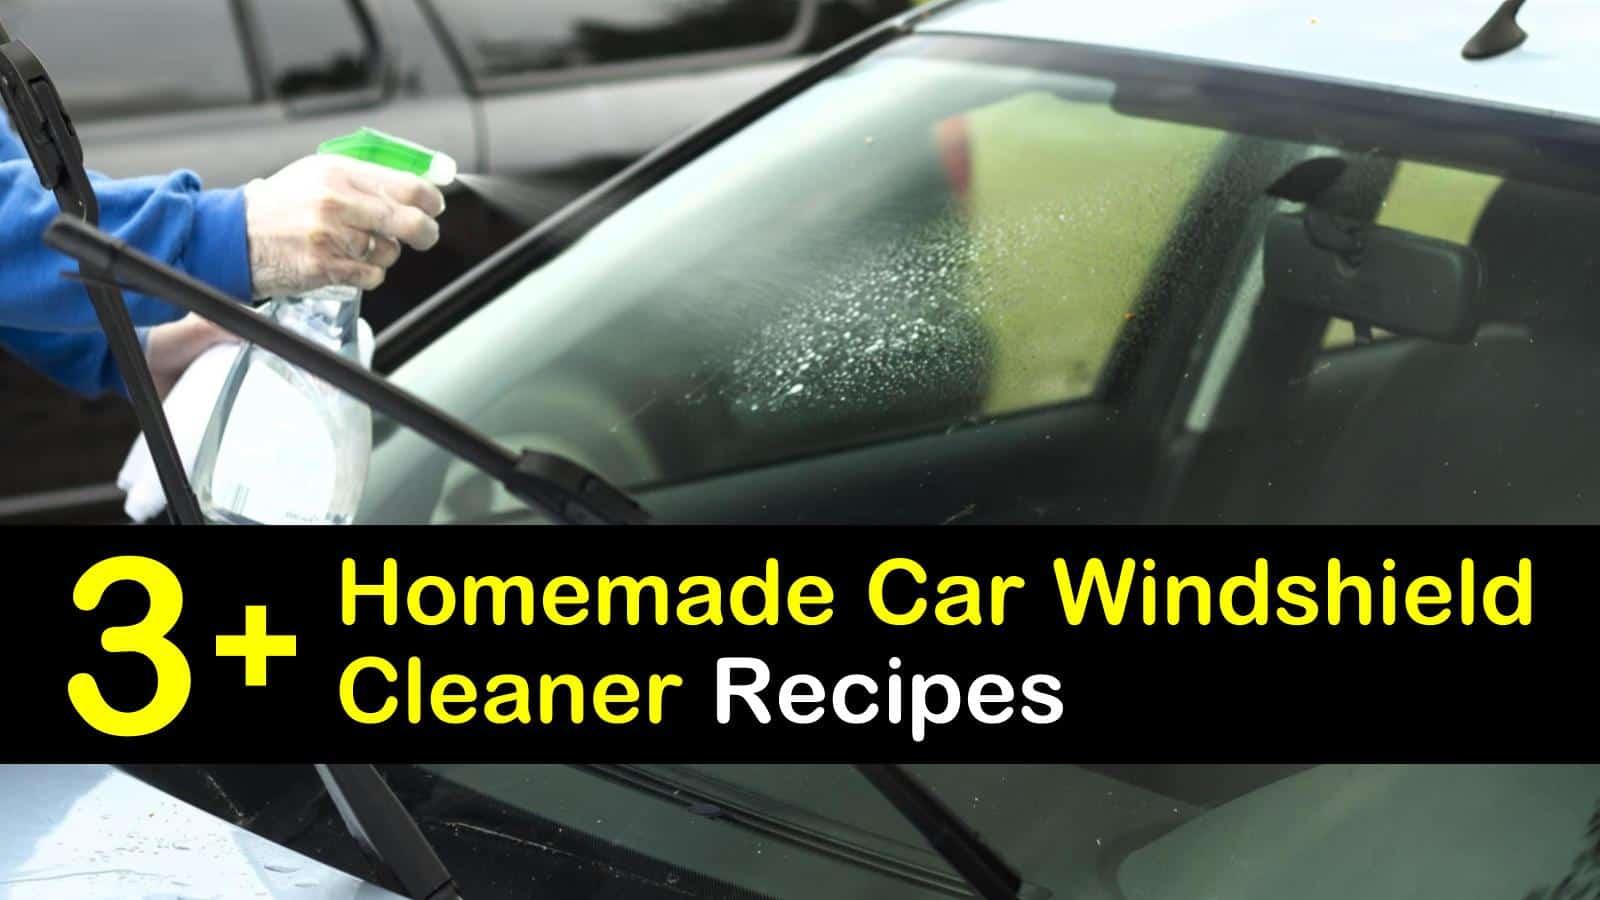 homemade car windshield cleaner titleimg1